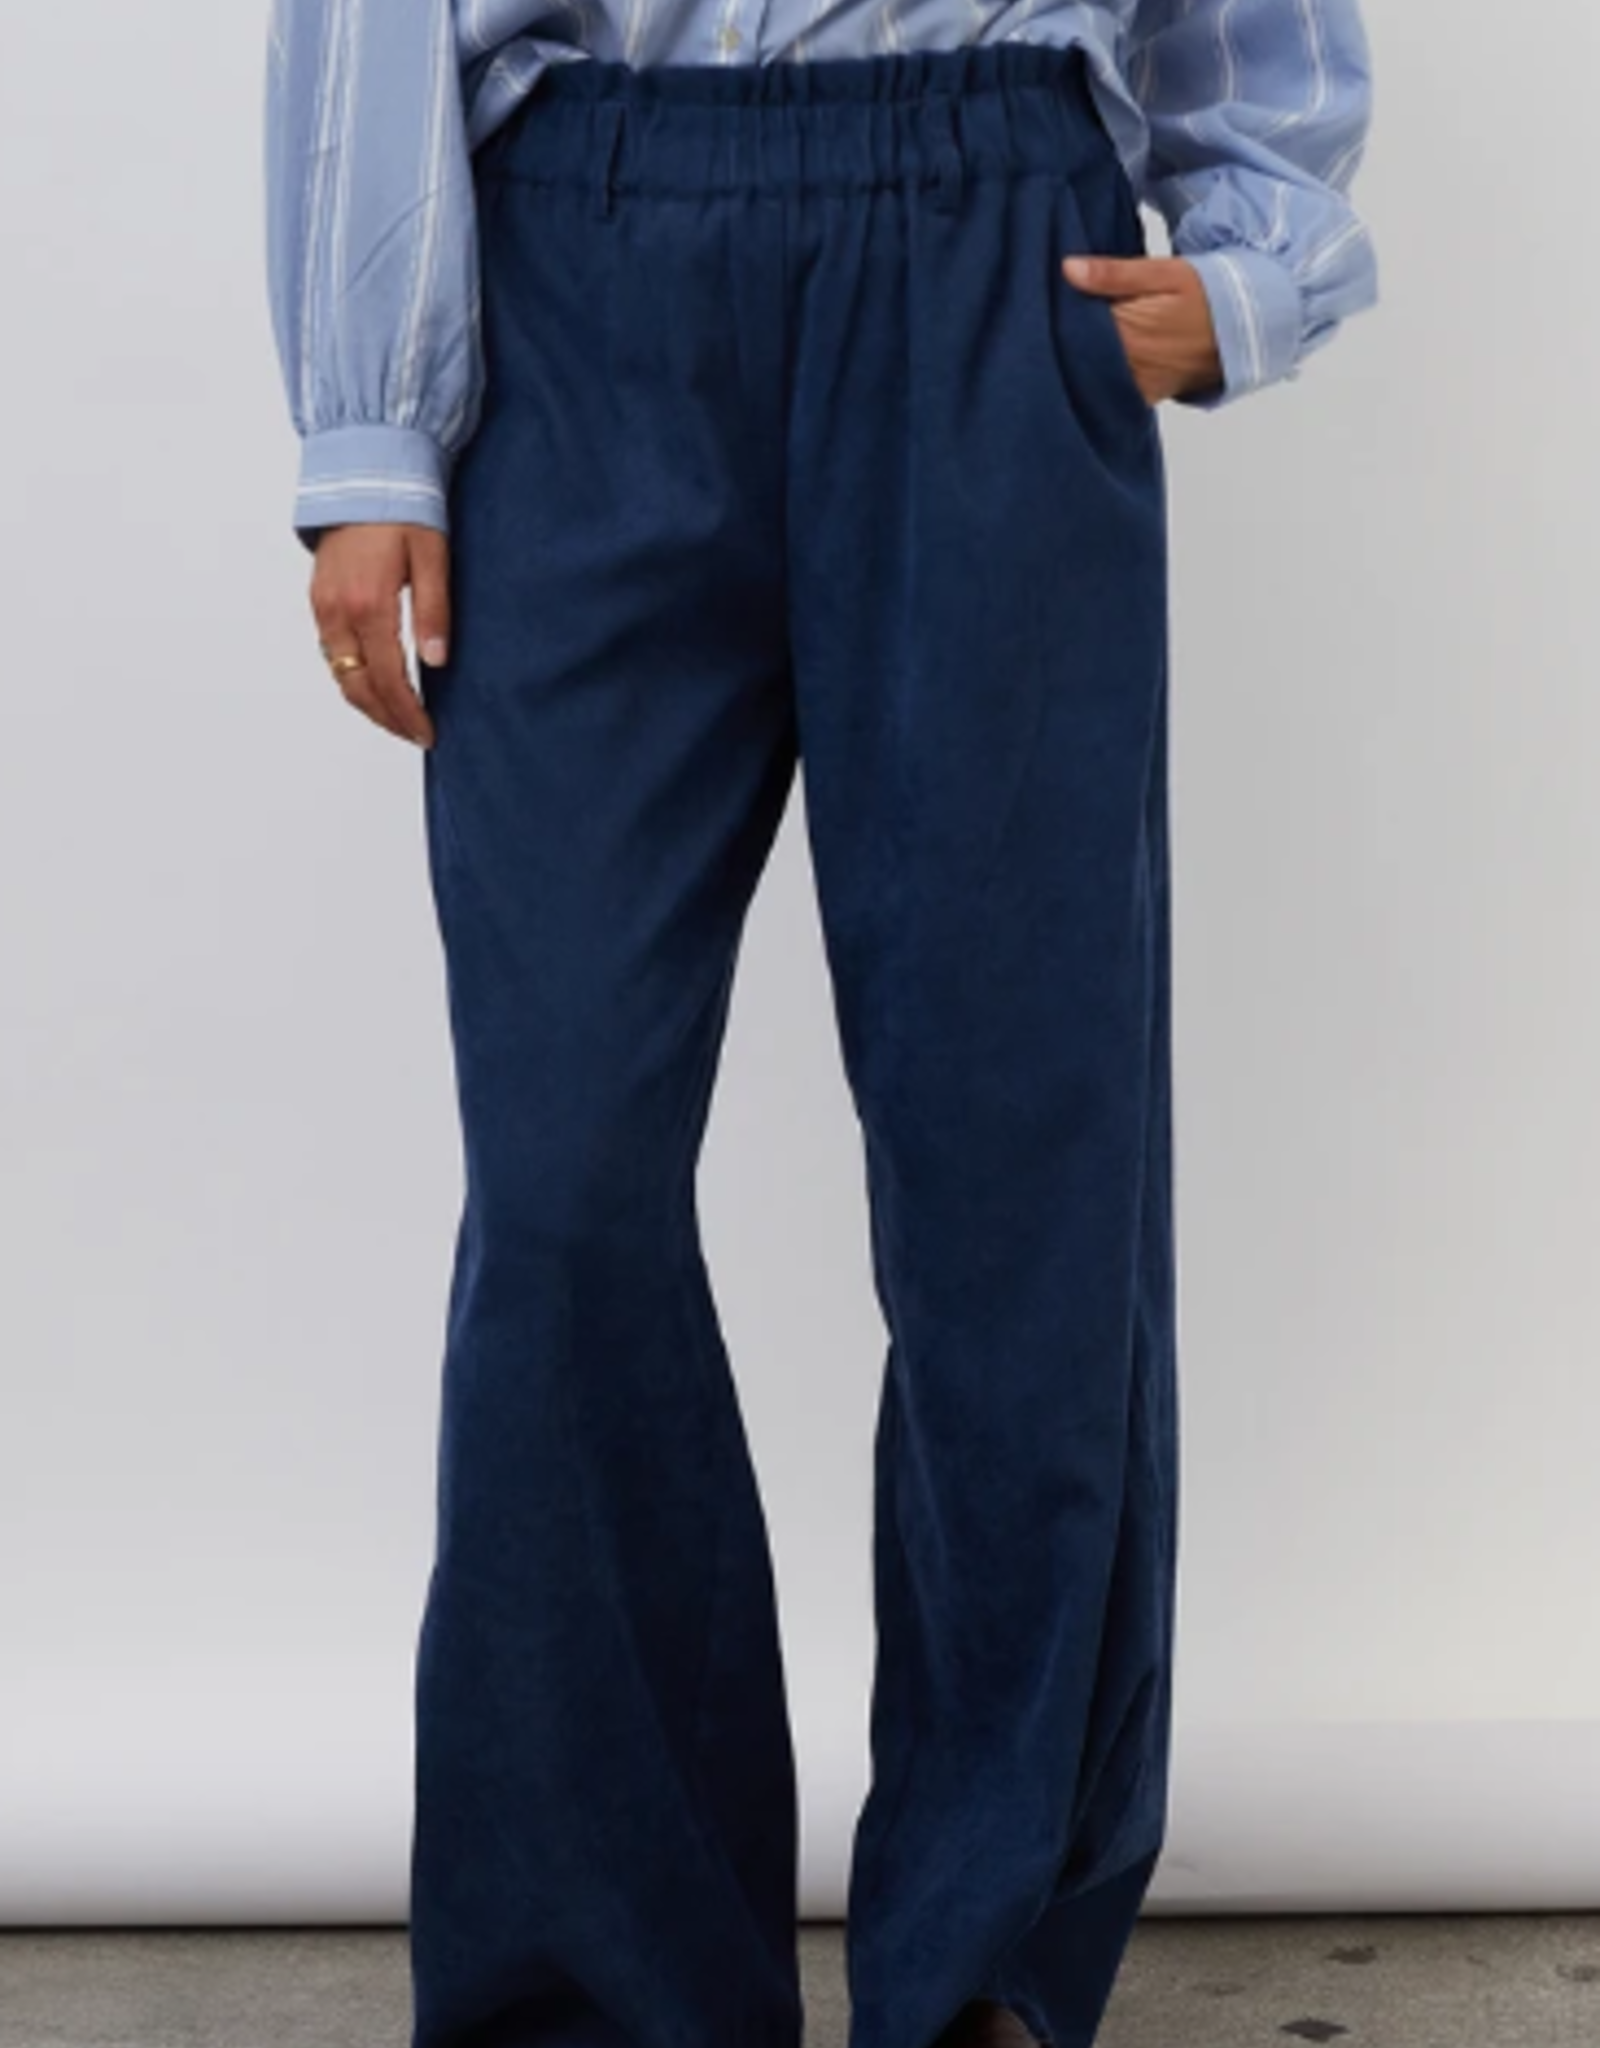 Lolly's Laundry Lolly's Laundry - Vicky Pants - Dark blue